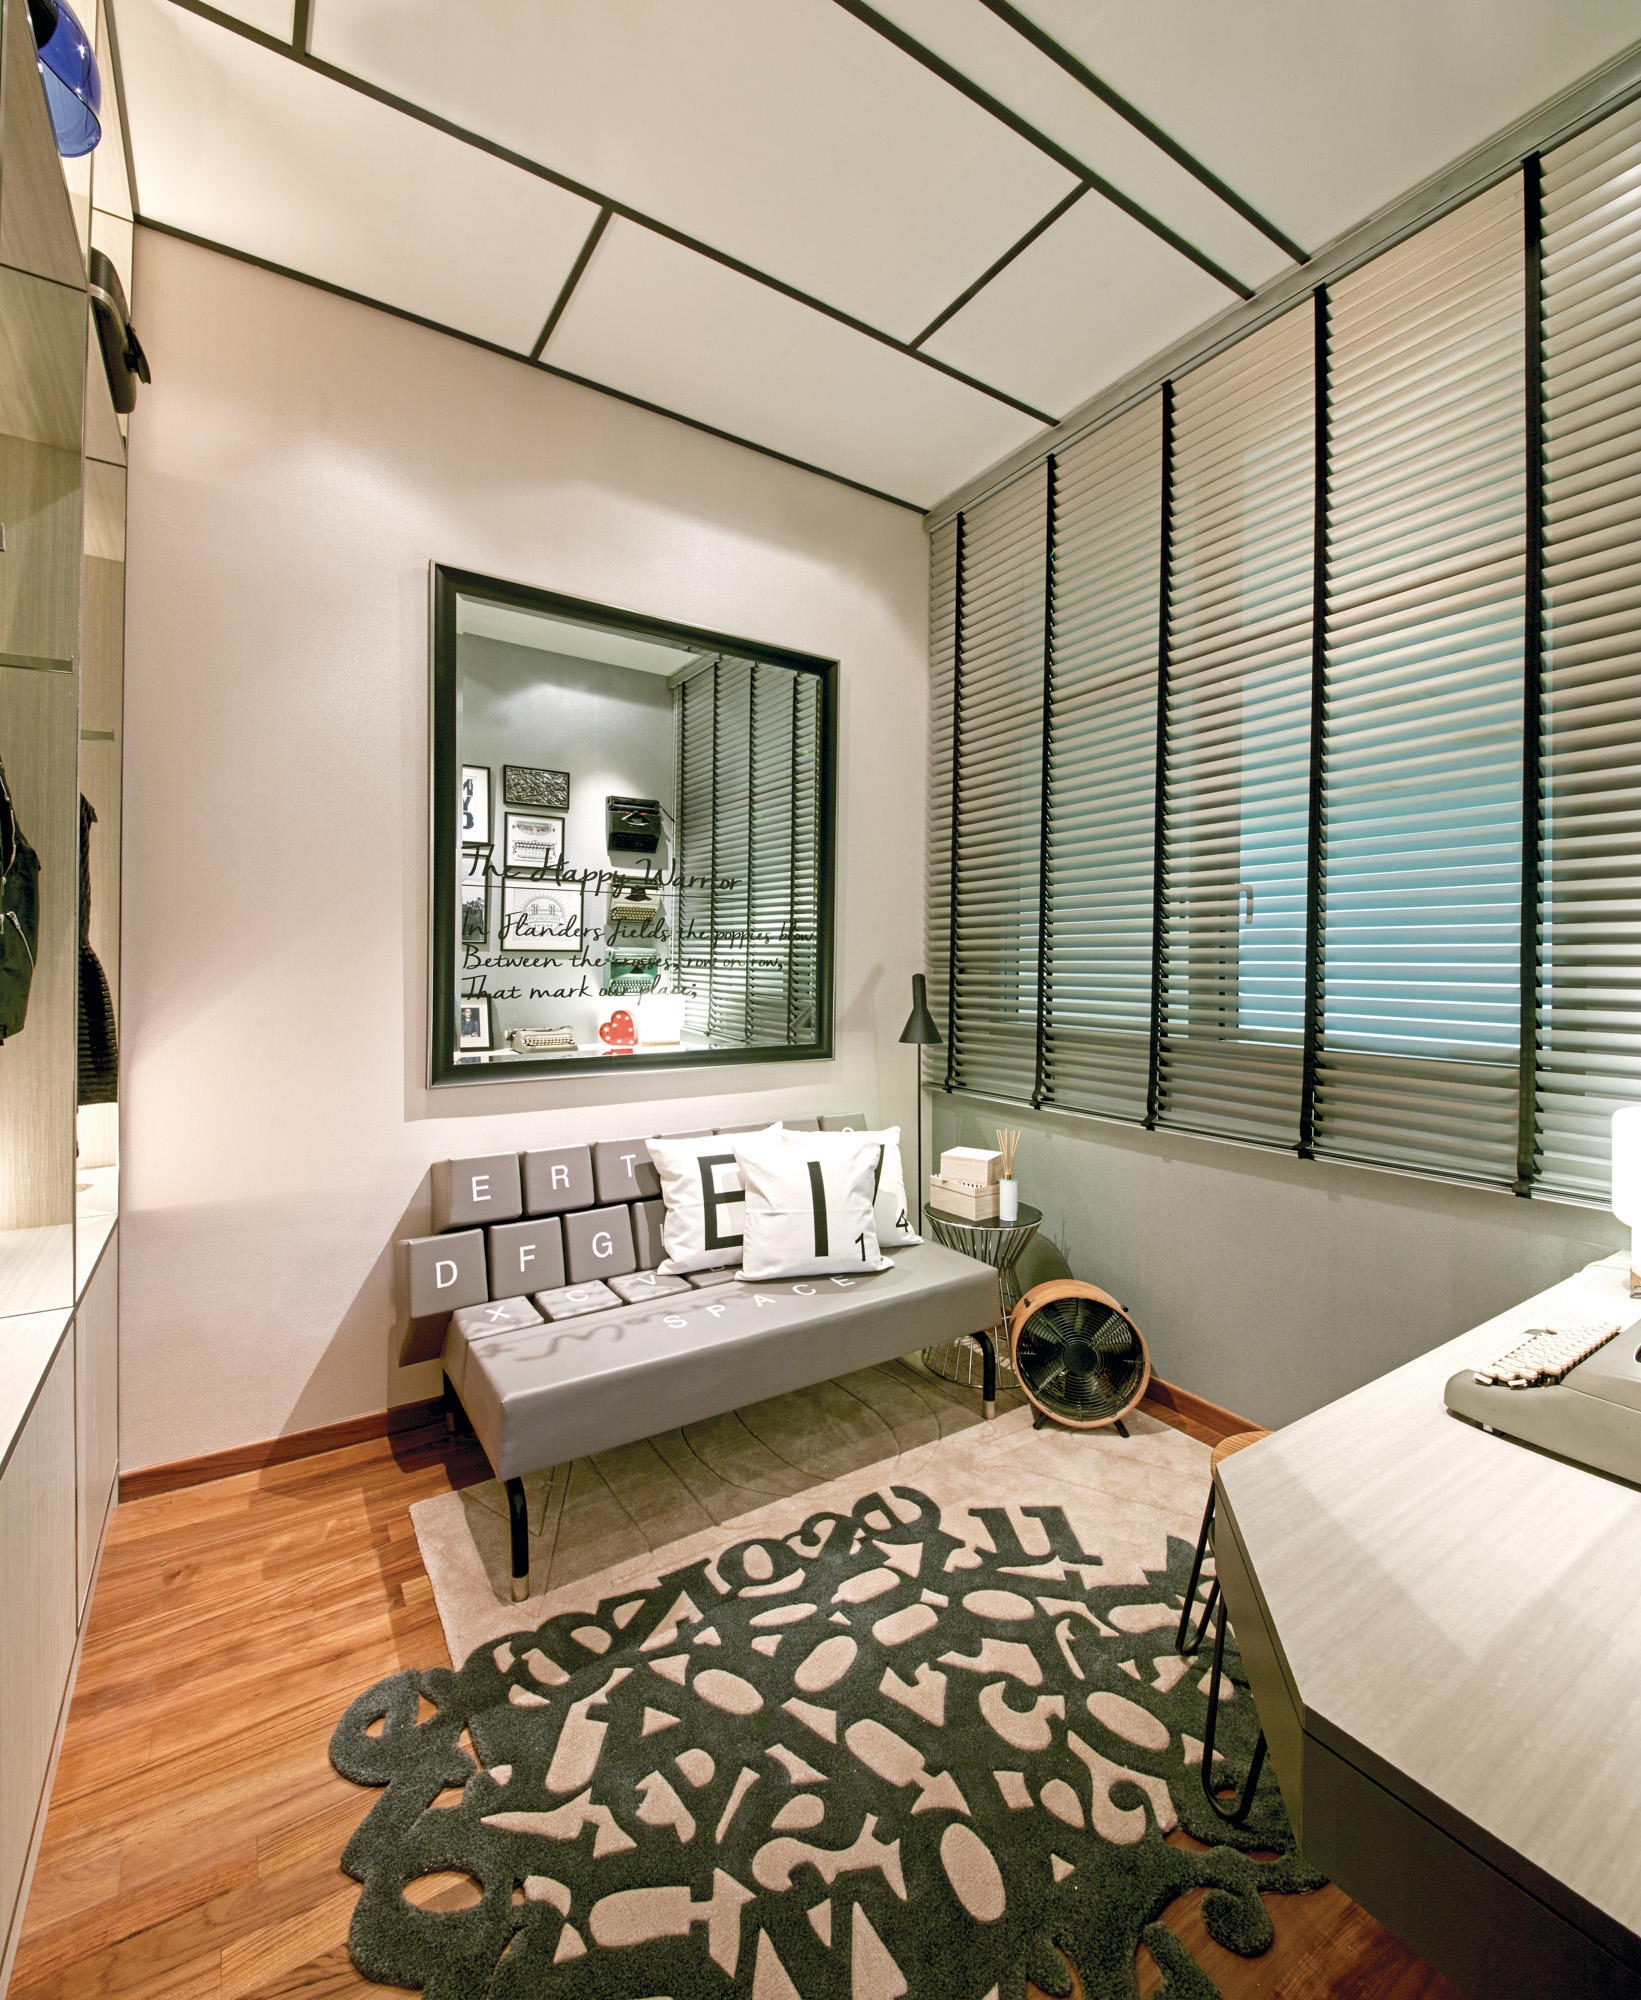 Sturdee Residence Interior 1 Study